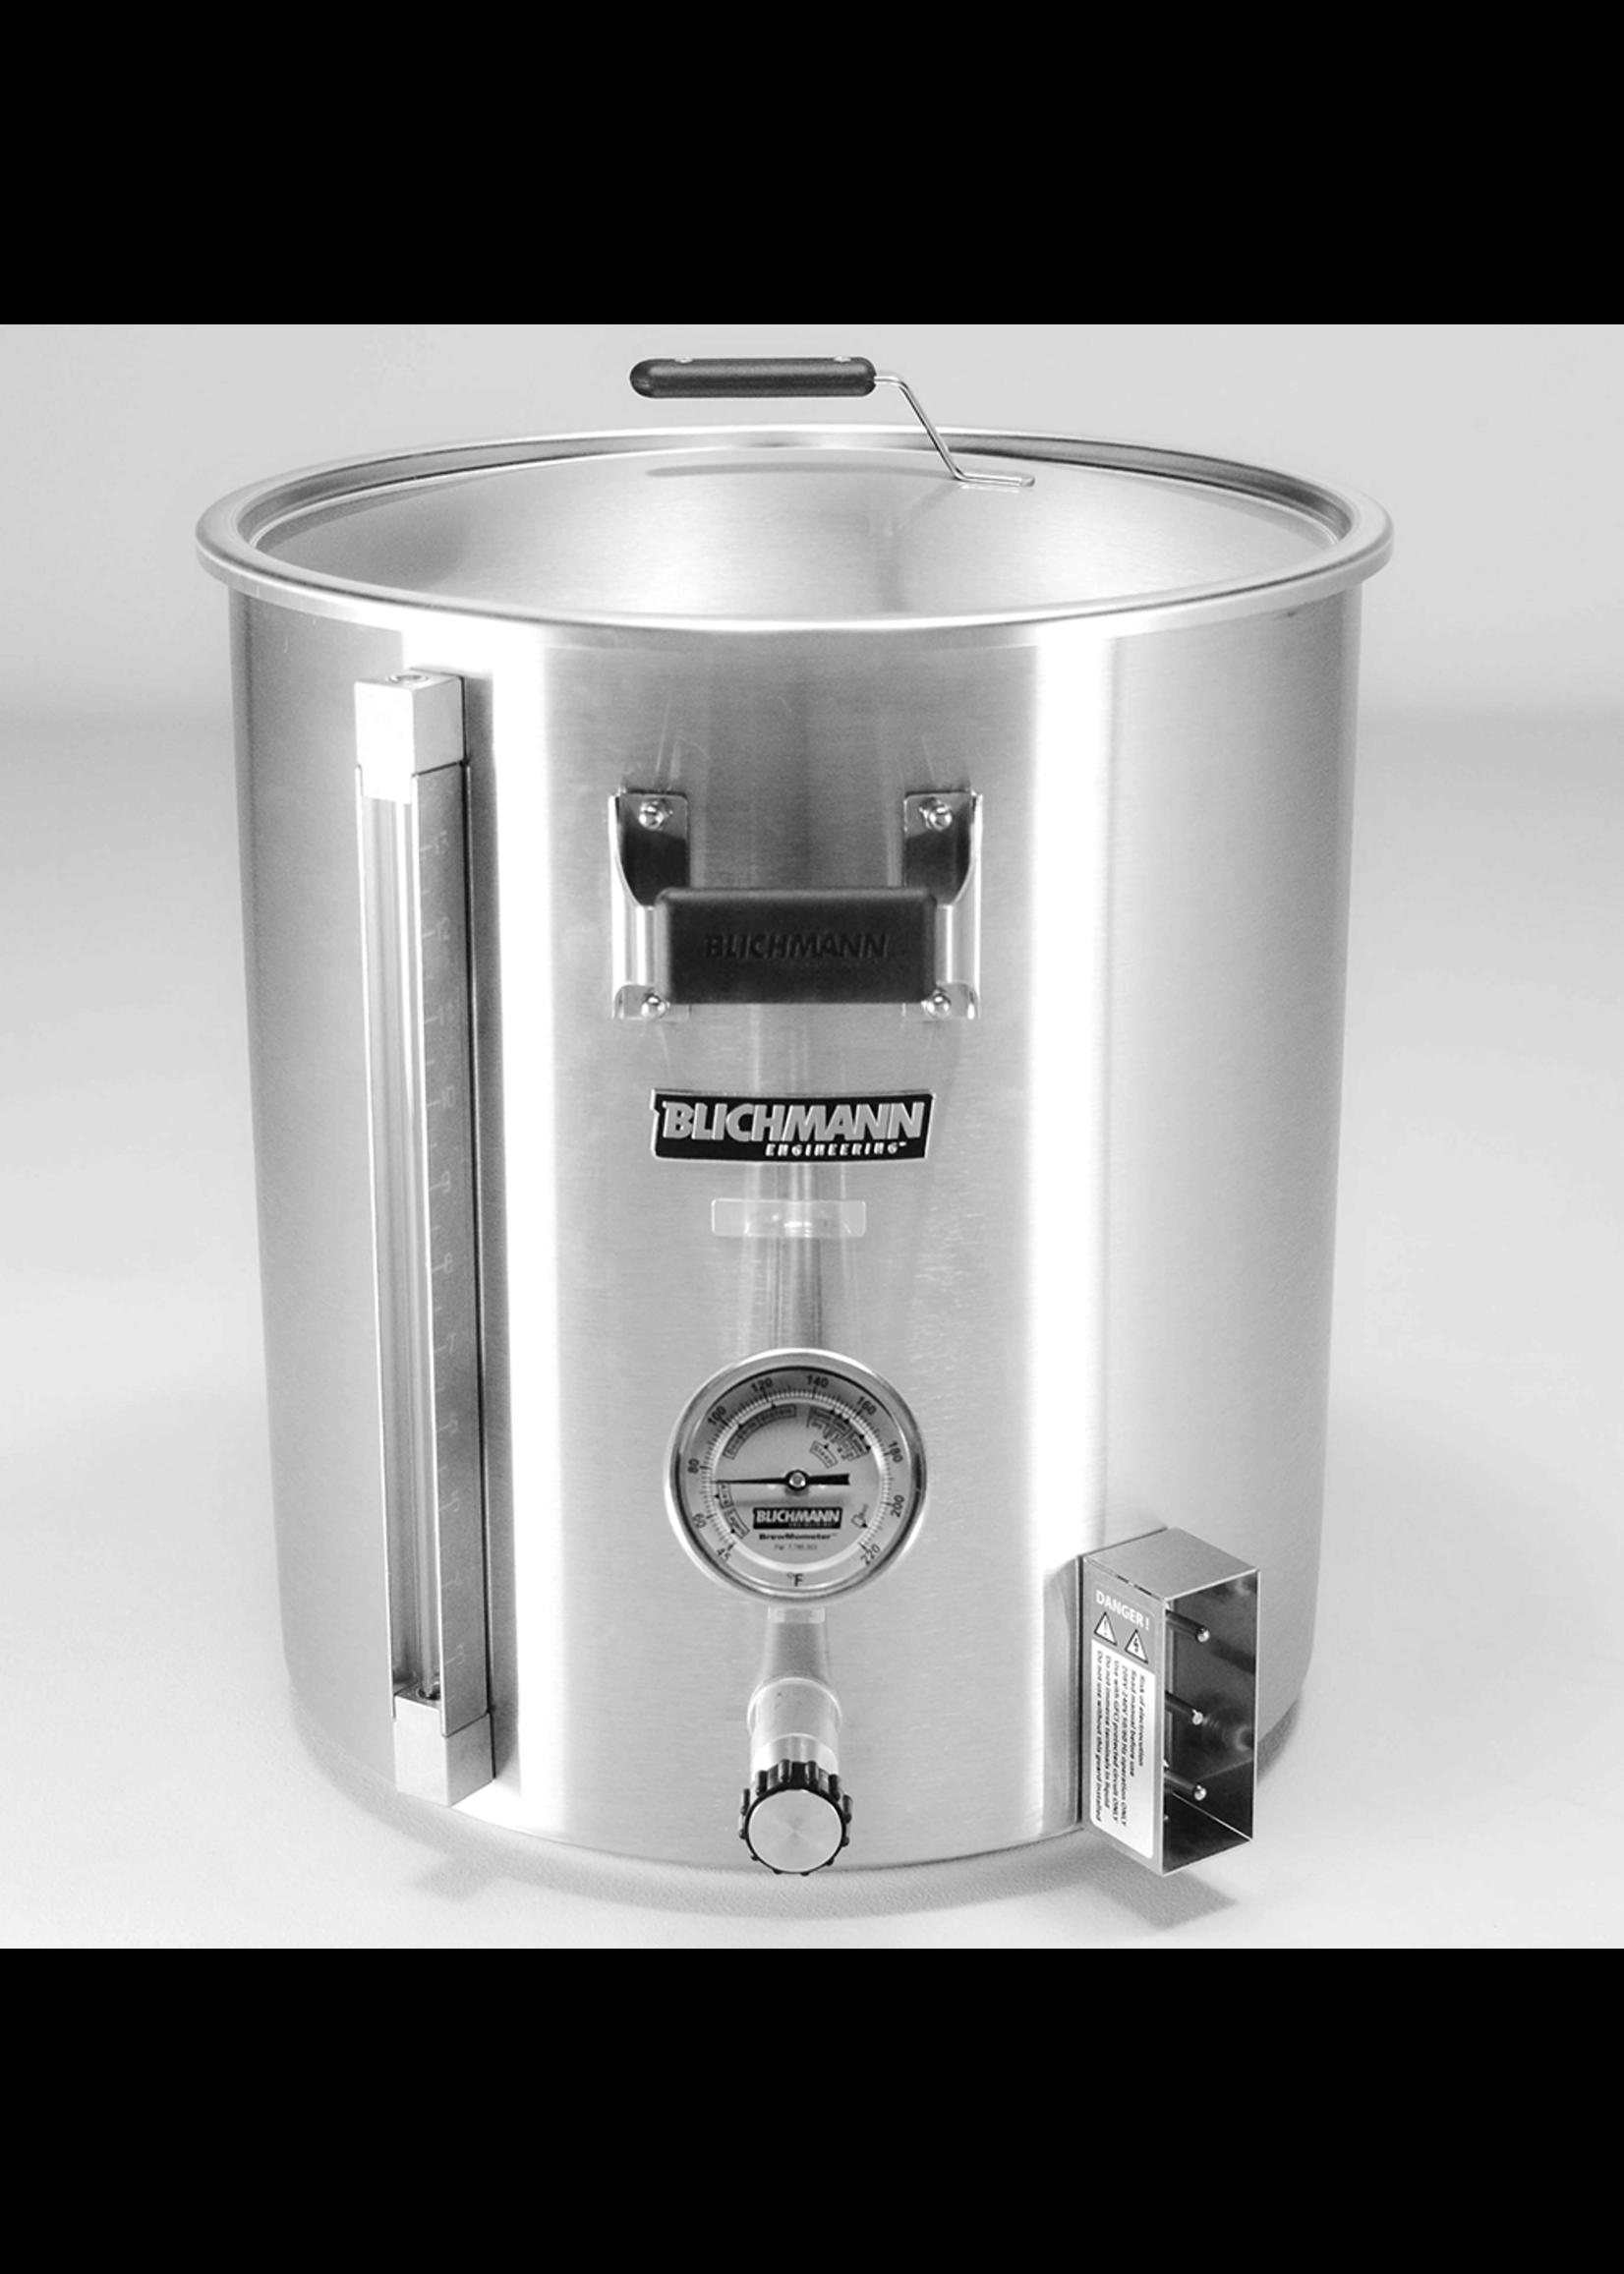 Blichmann Blichmann BoilerMaker G2 - 7.5 Gallon 120V Electric Brew Kettle (Fahrenheit)